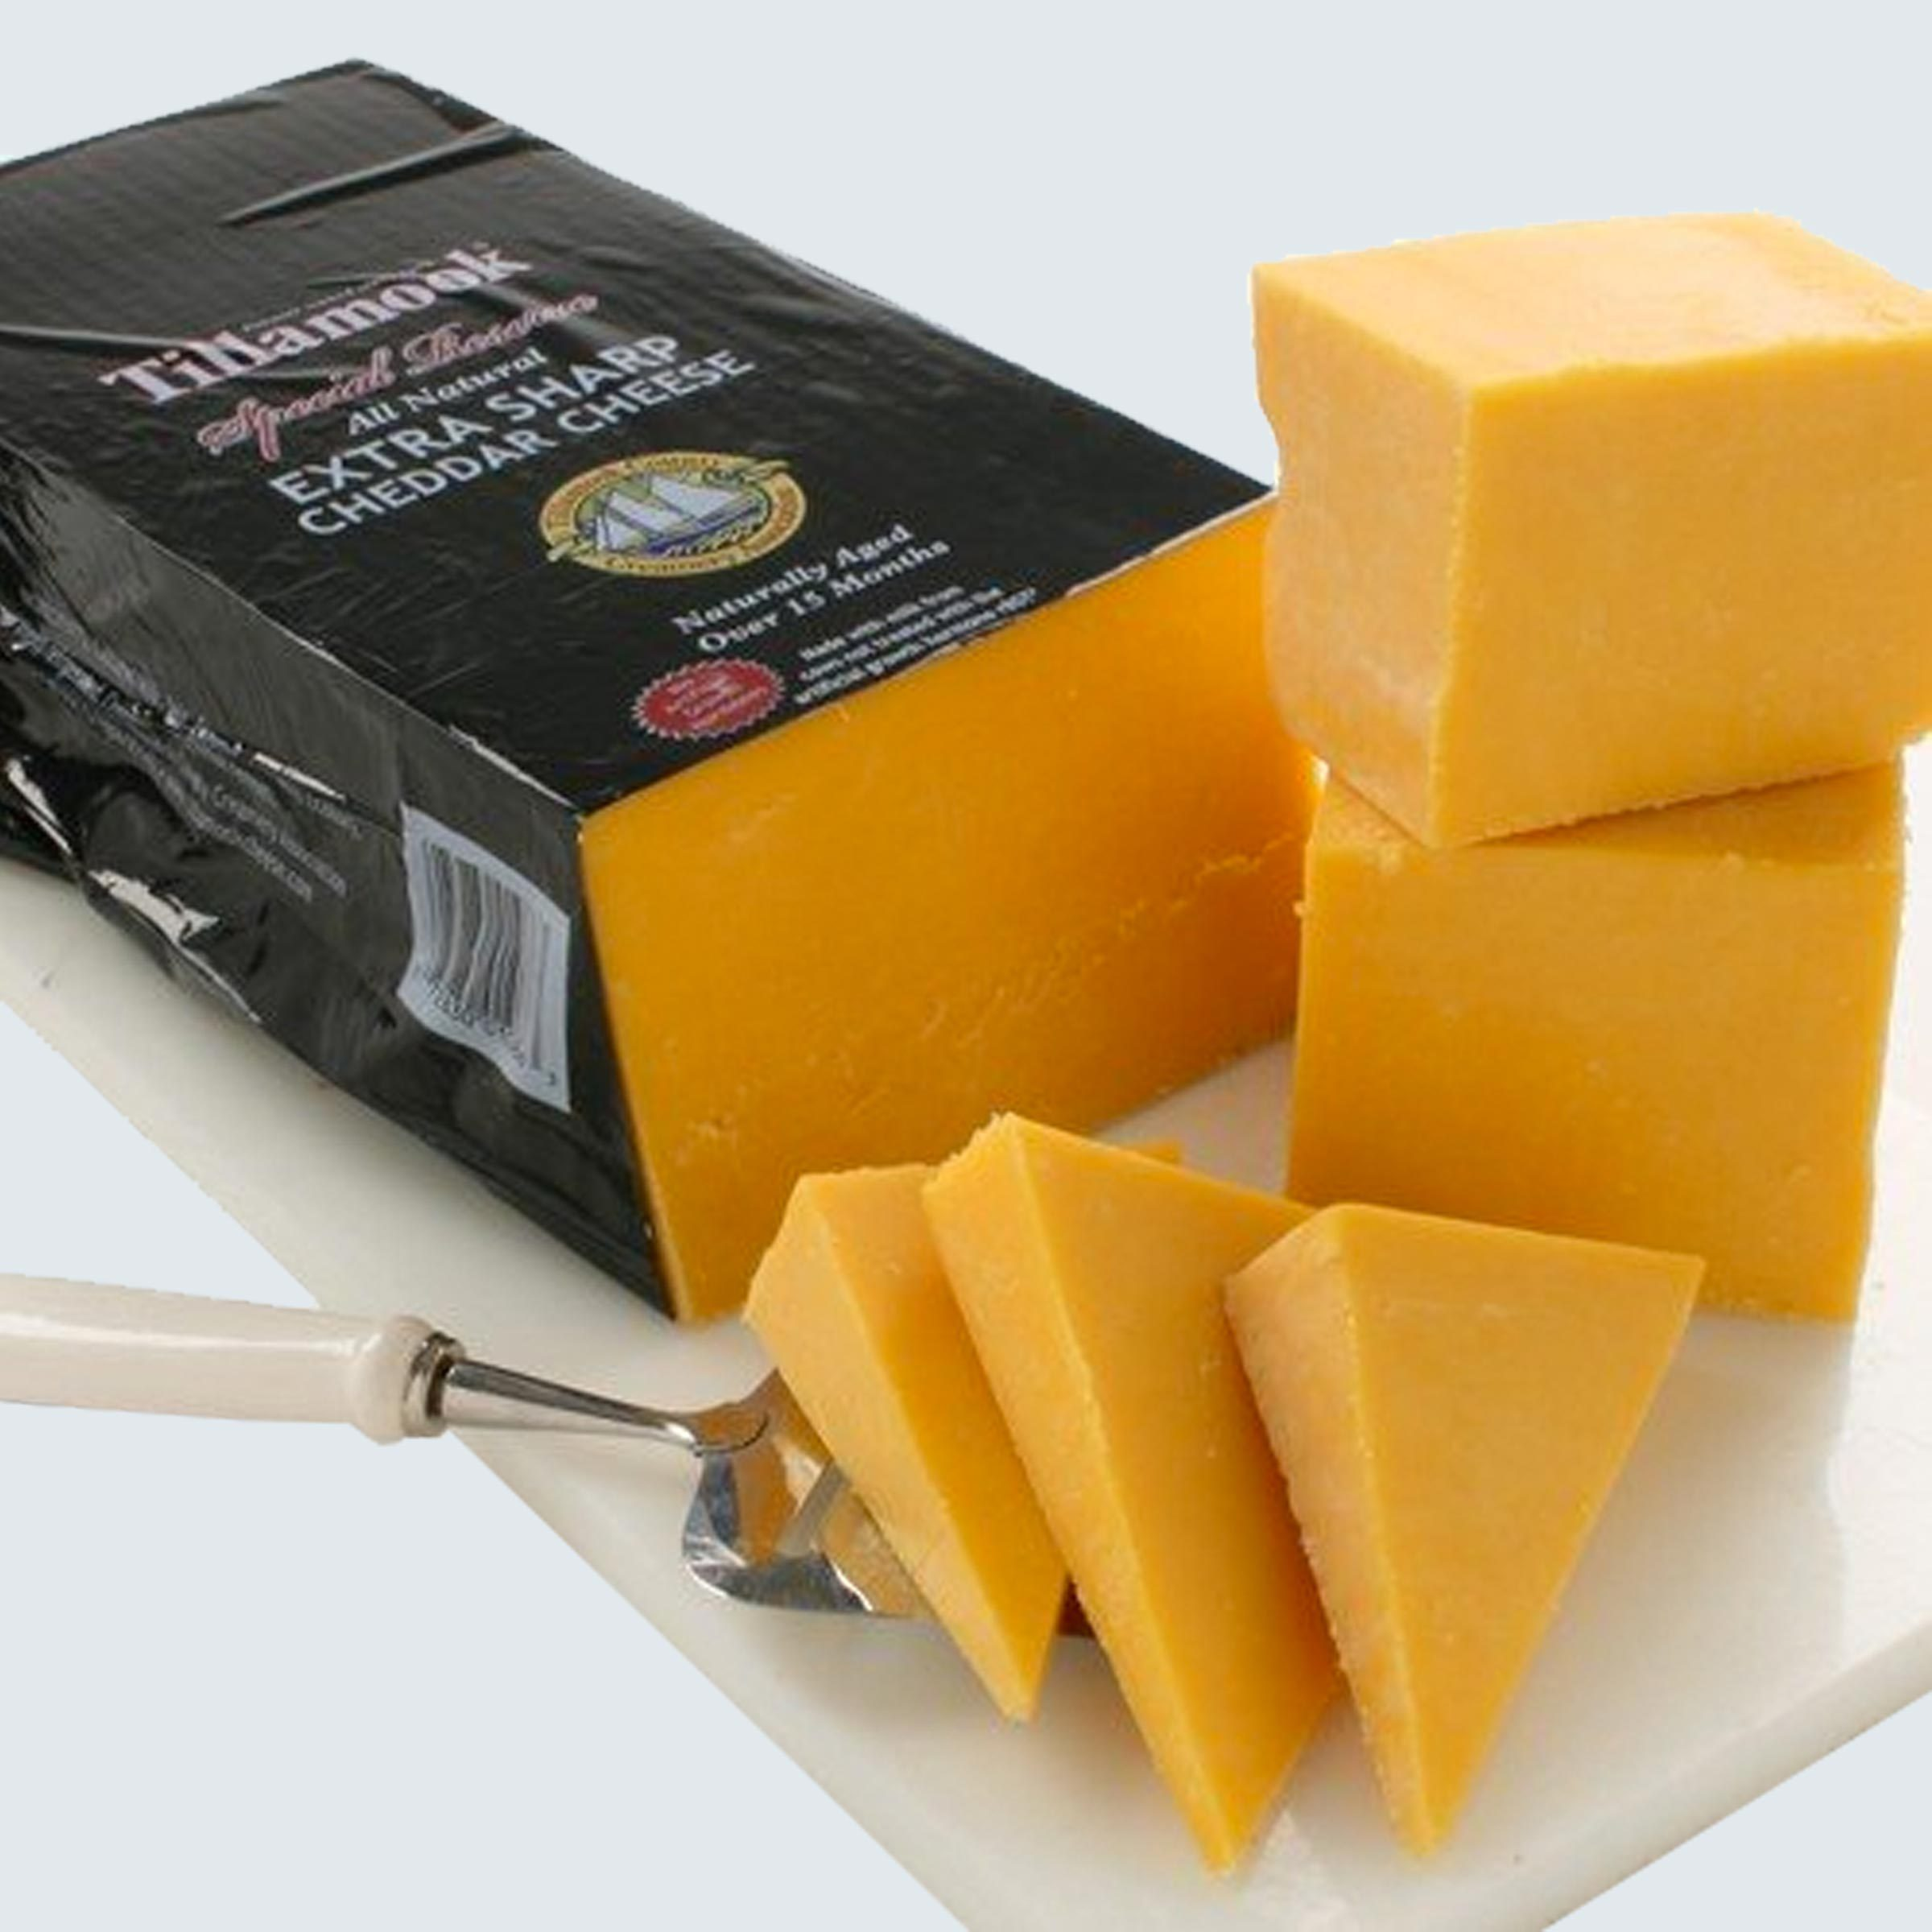 Tillamook Cheddar dairy products